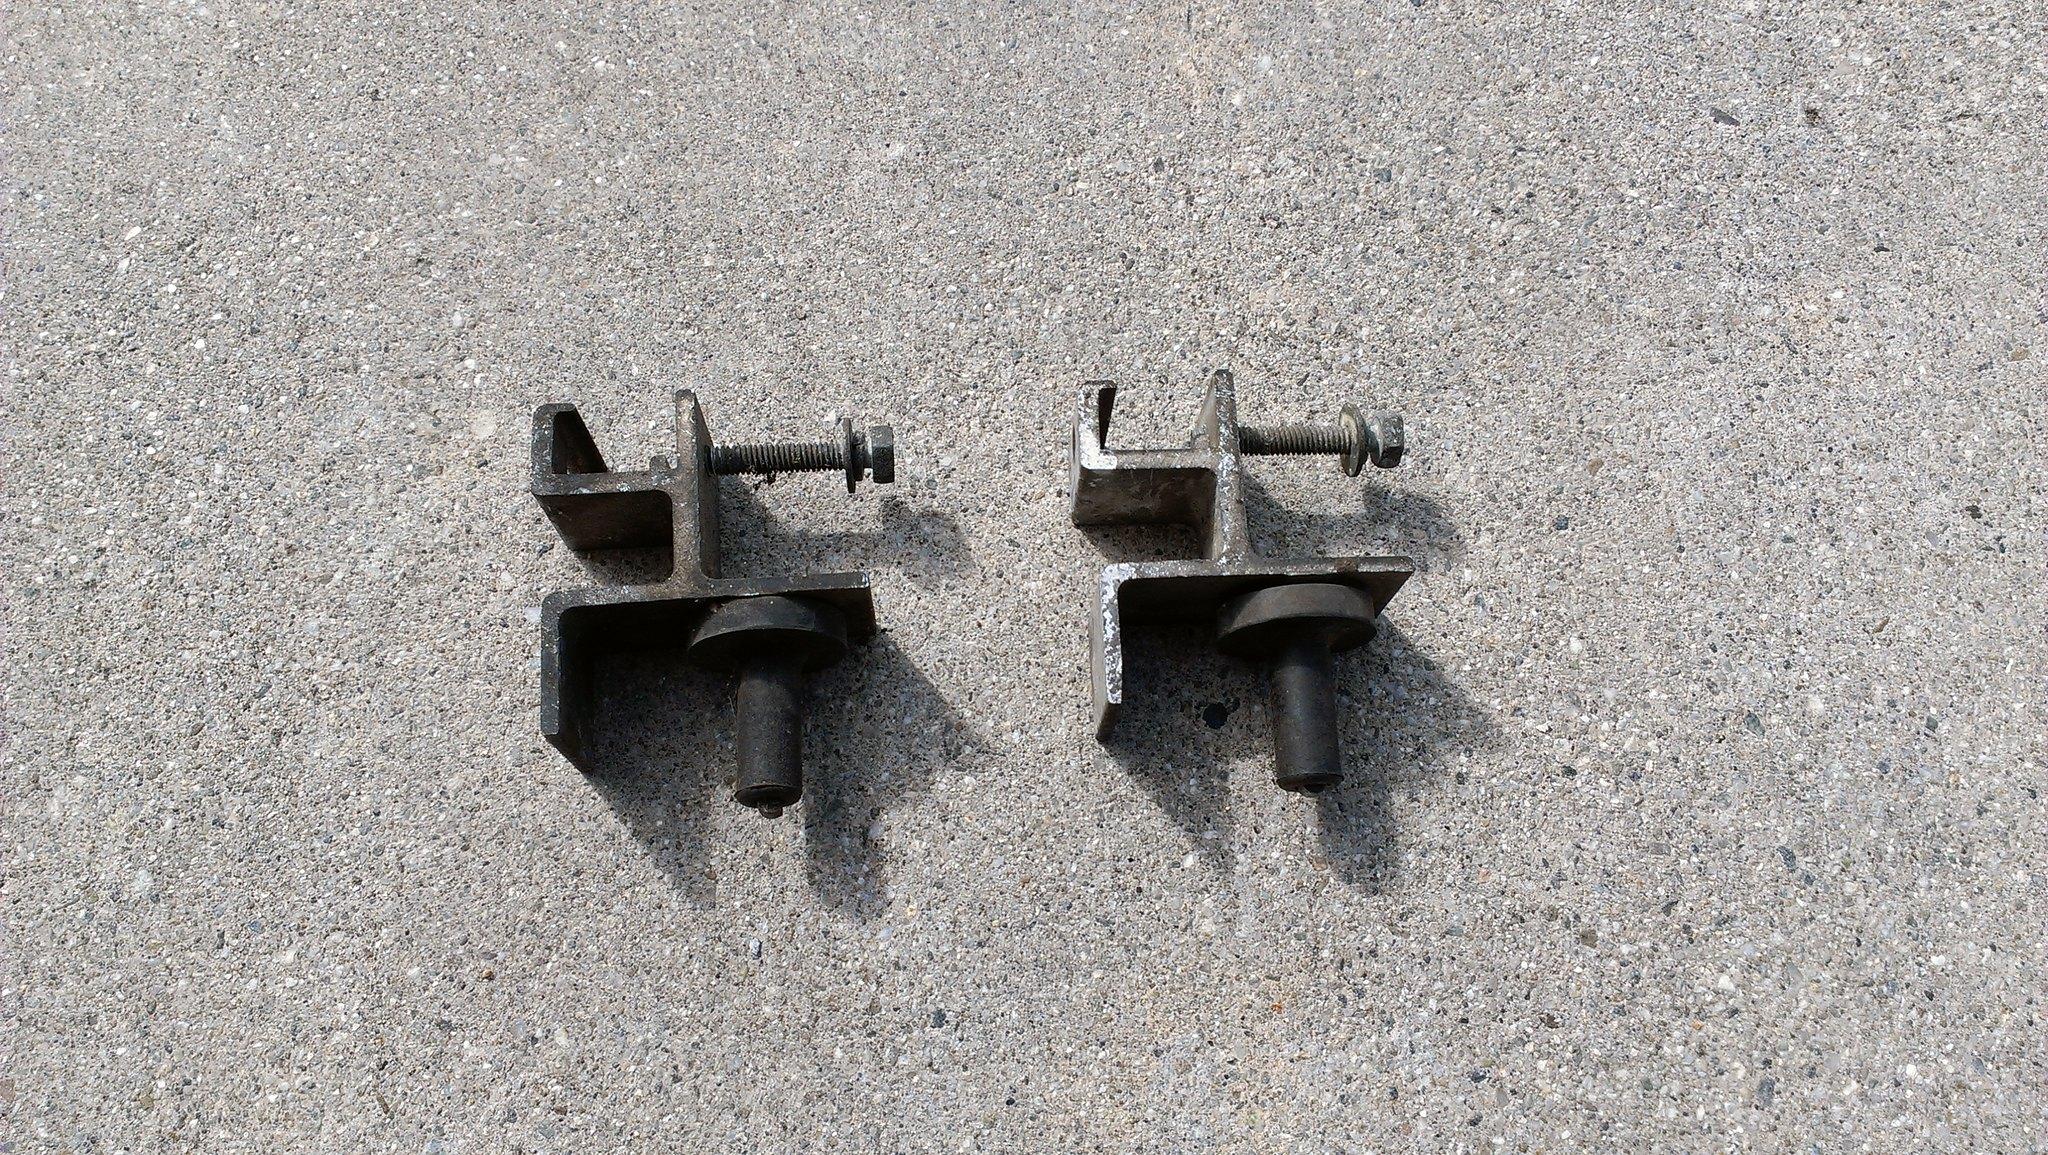 Fs For Sale Subaru Impreza Motor Parts